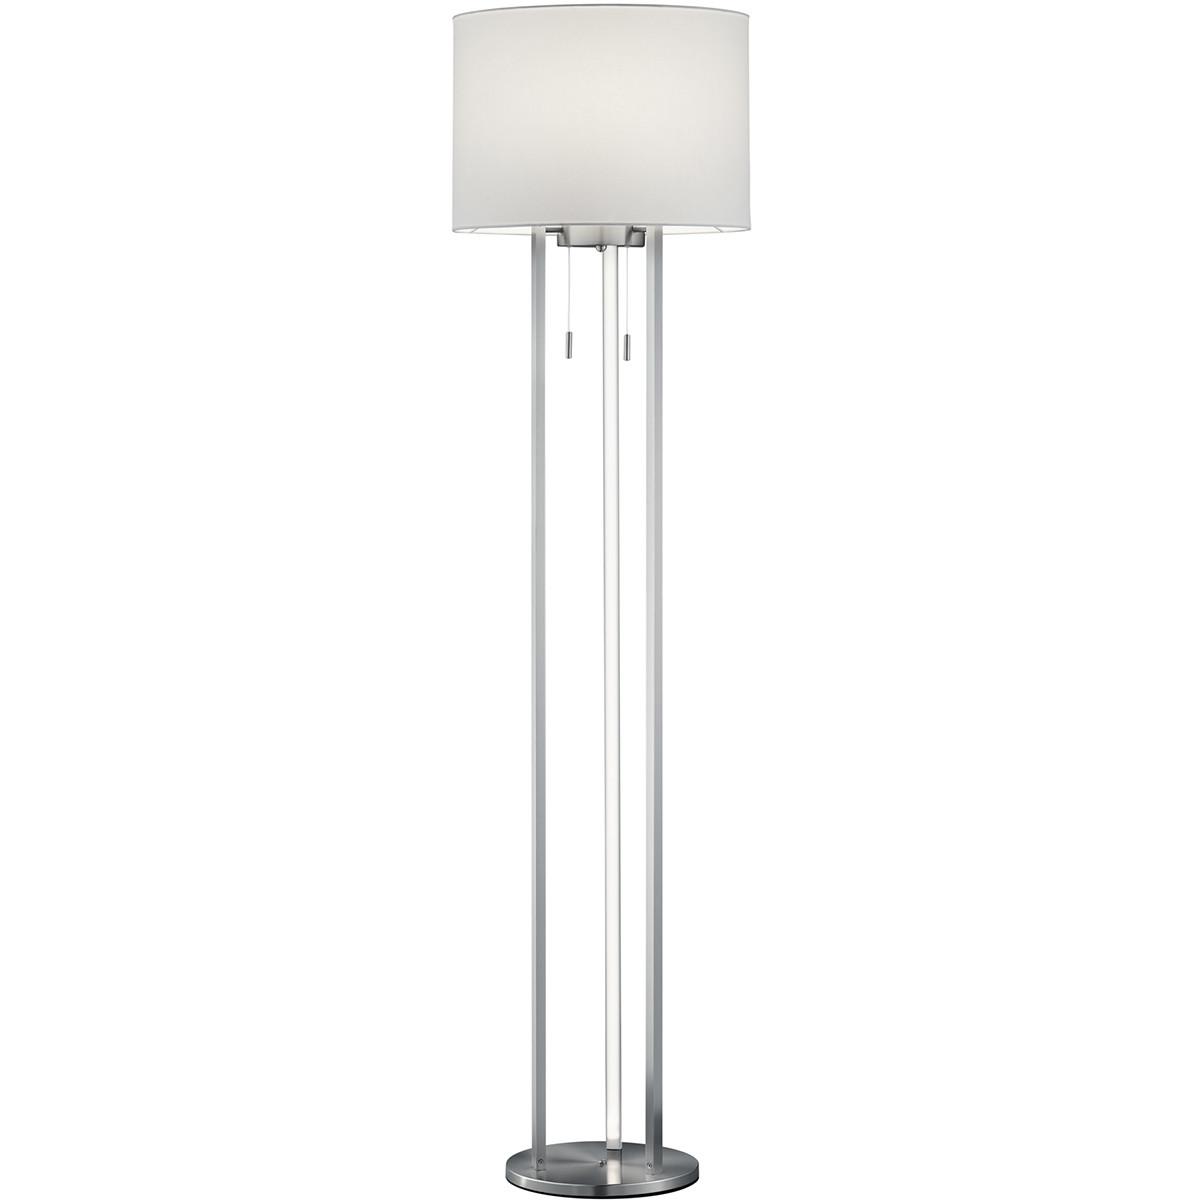 LED Vloerlamp - Trion Tondira - 15W - Warm Wit 3000K - E27 Fitting - 4-lichts - Rond - Mat Nikkel -